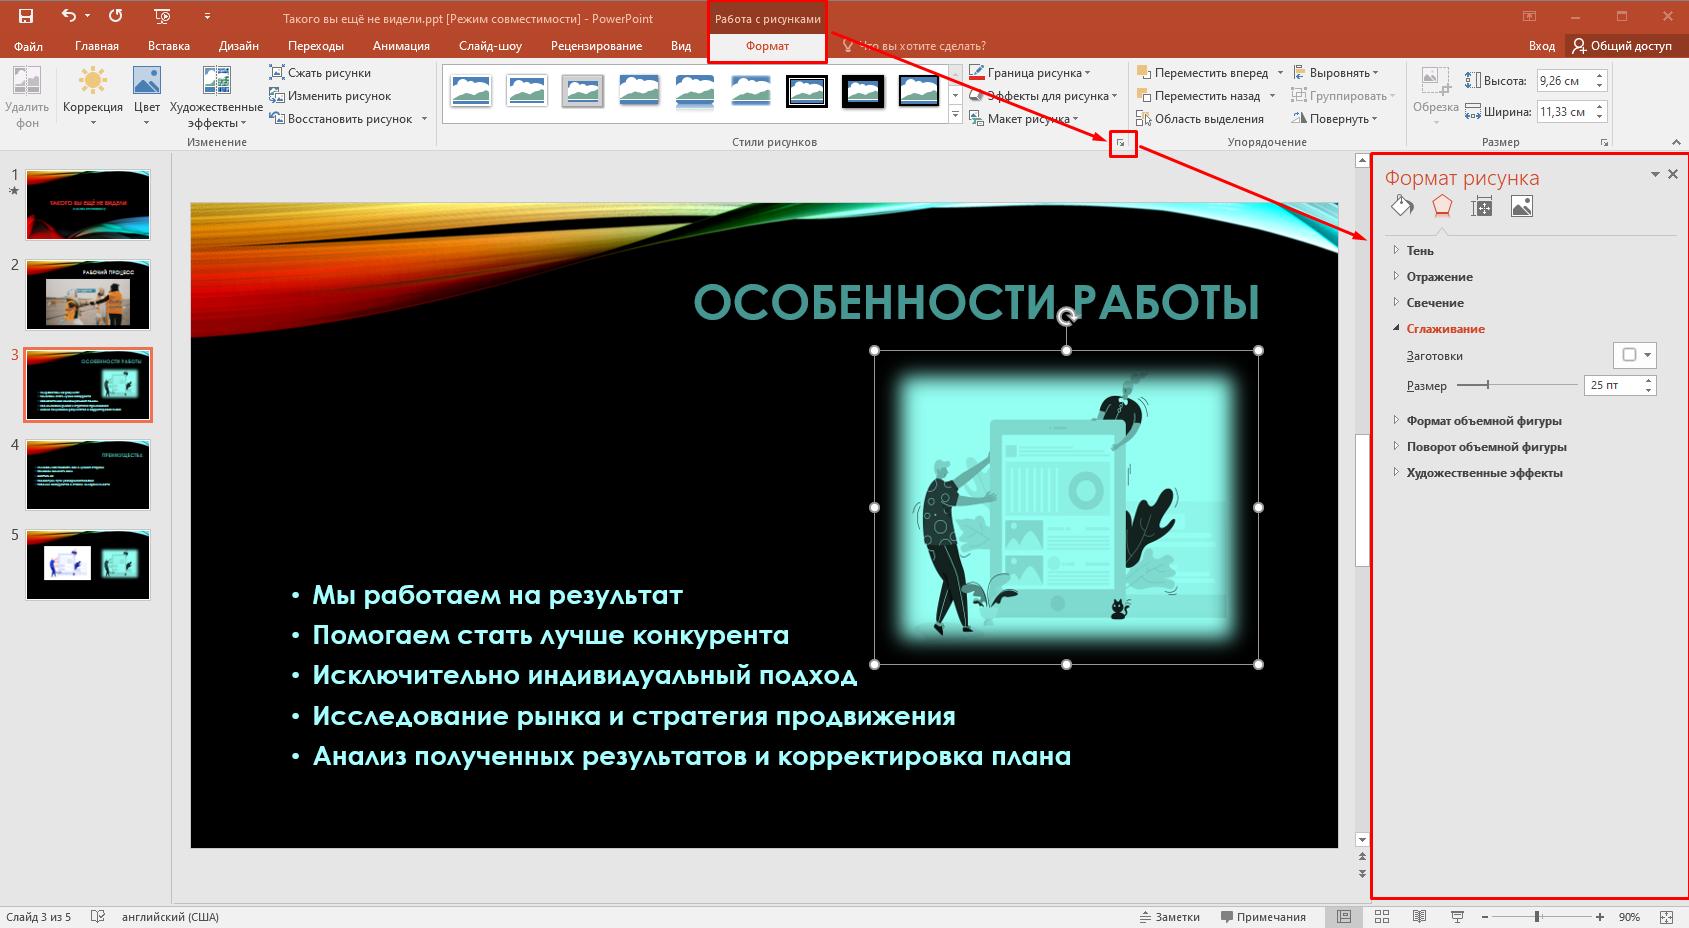 Формат рисунка в презентации Powerpoint